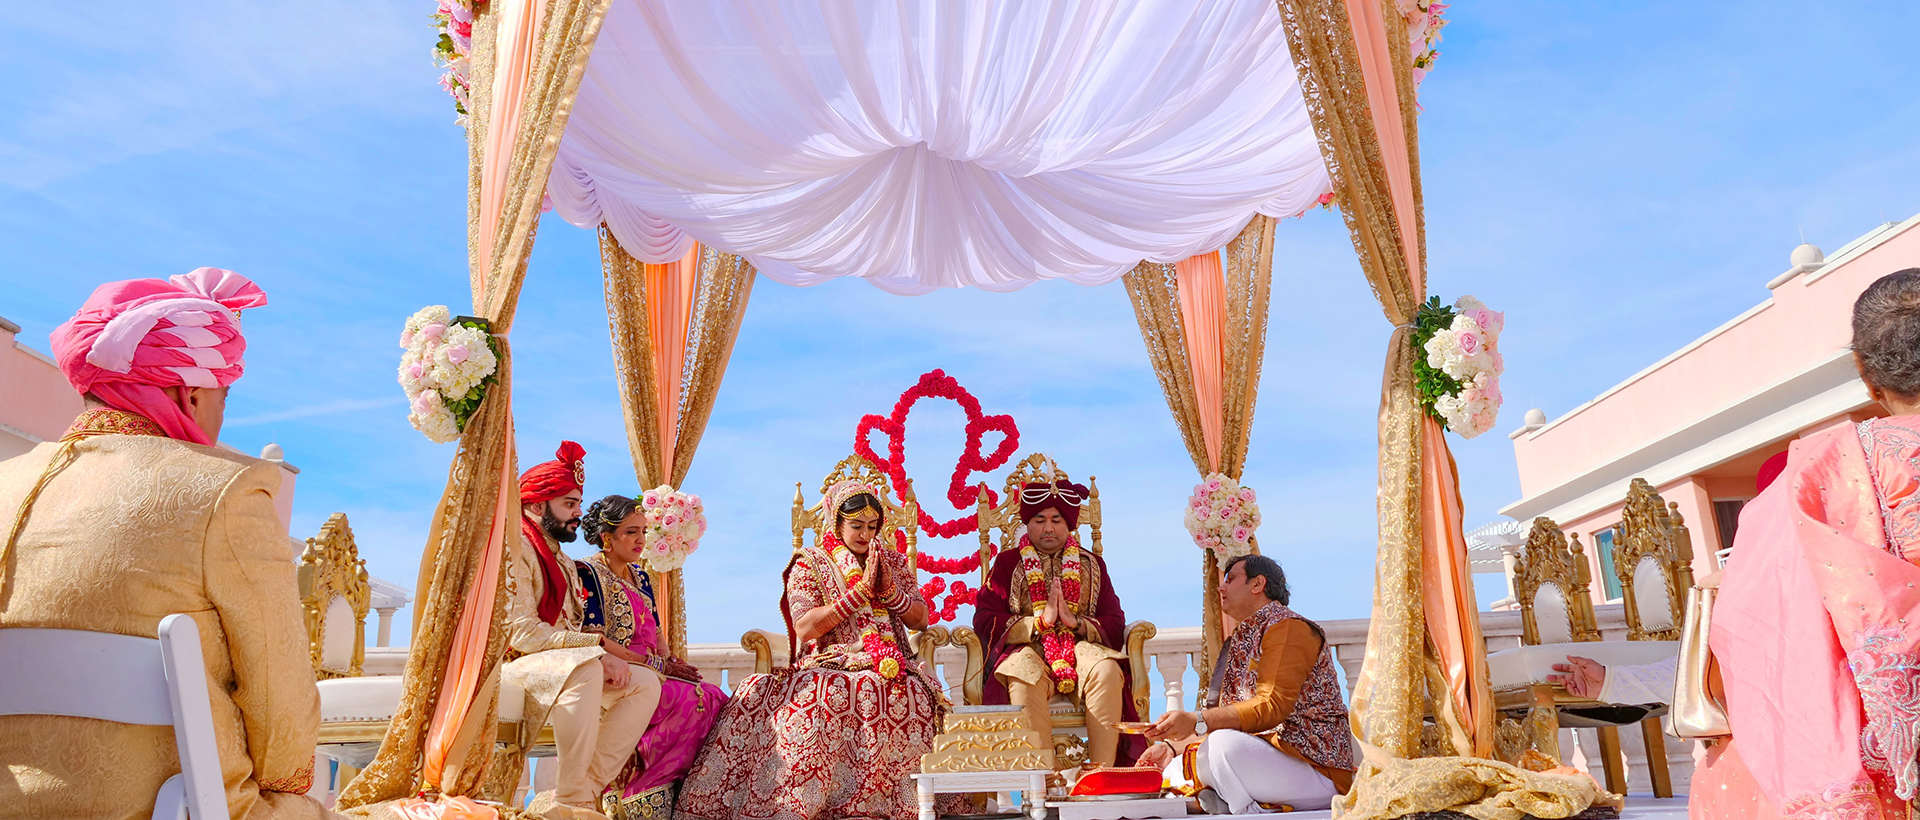 South Asian Celebrations